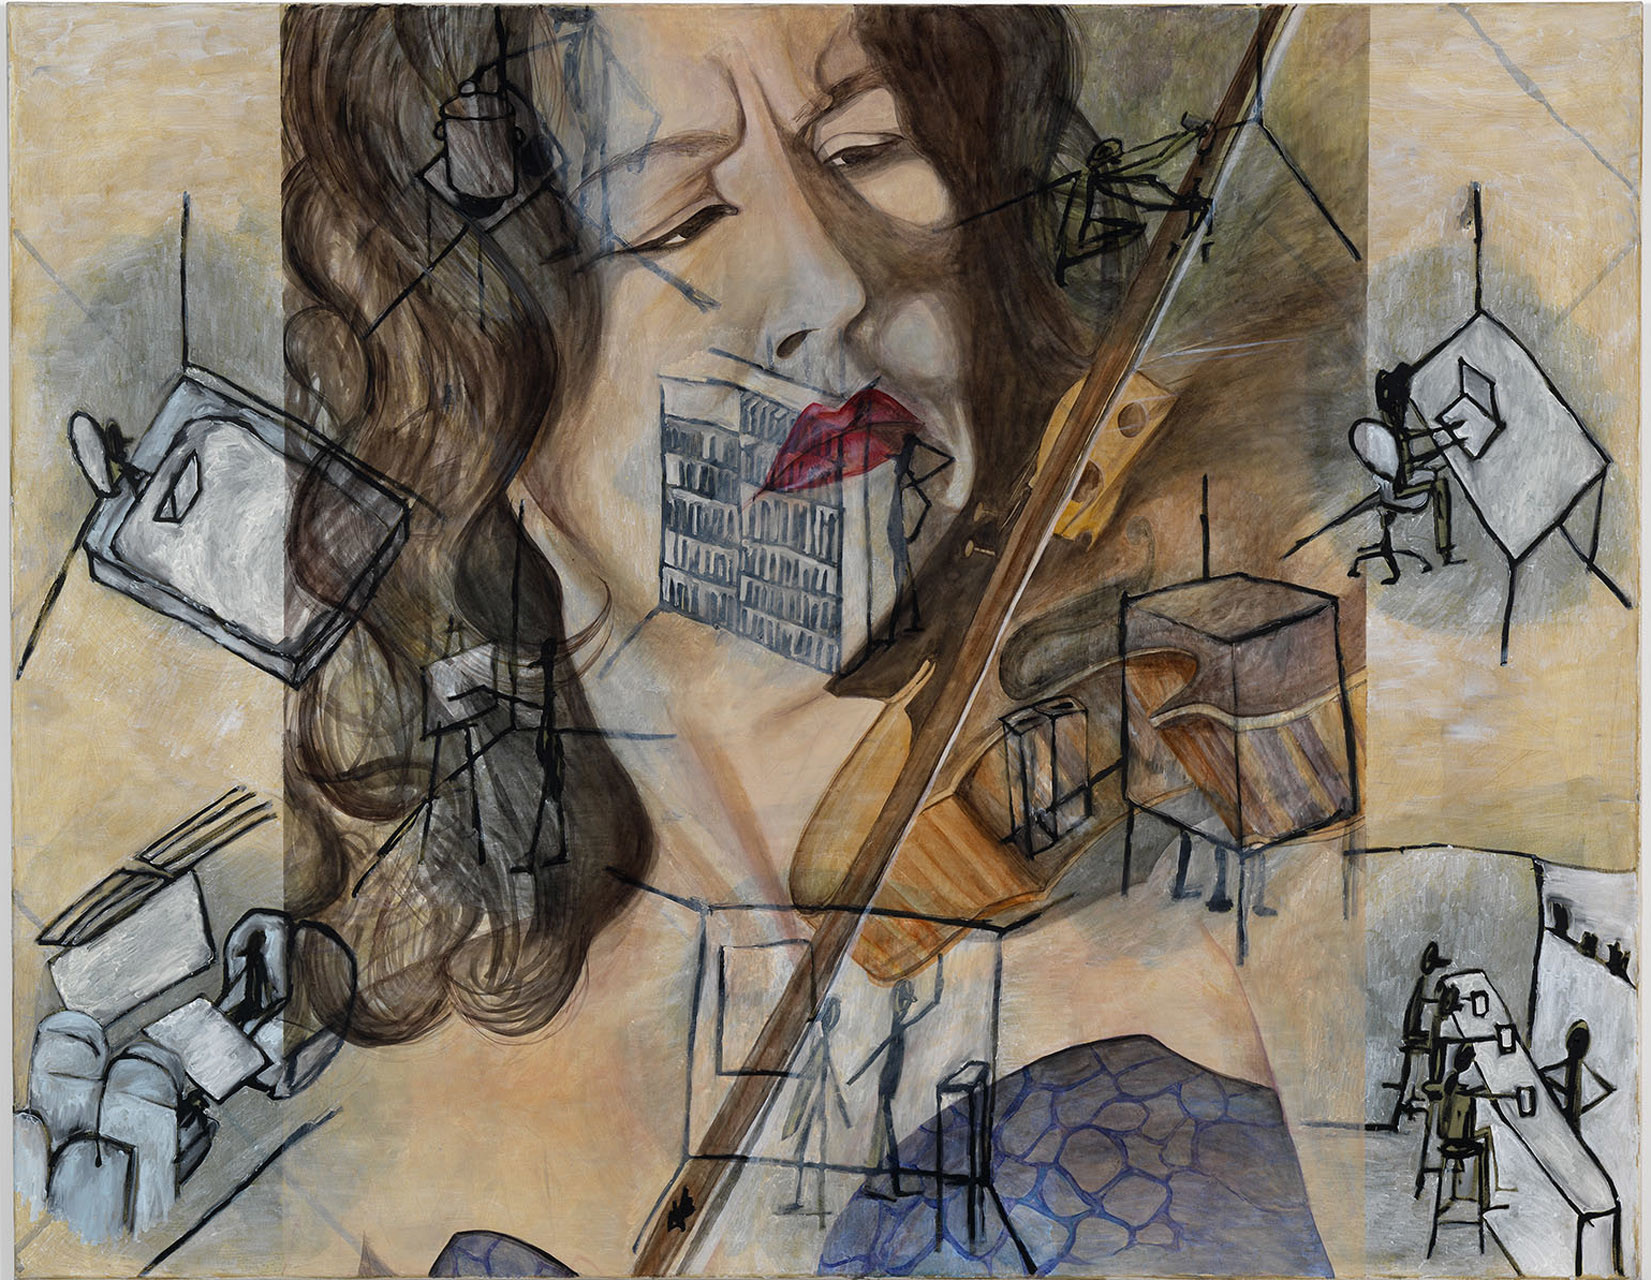 "<div class=""artwork_caption""><p>Jana Euler, Untitled, 2009</p></div>"